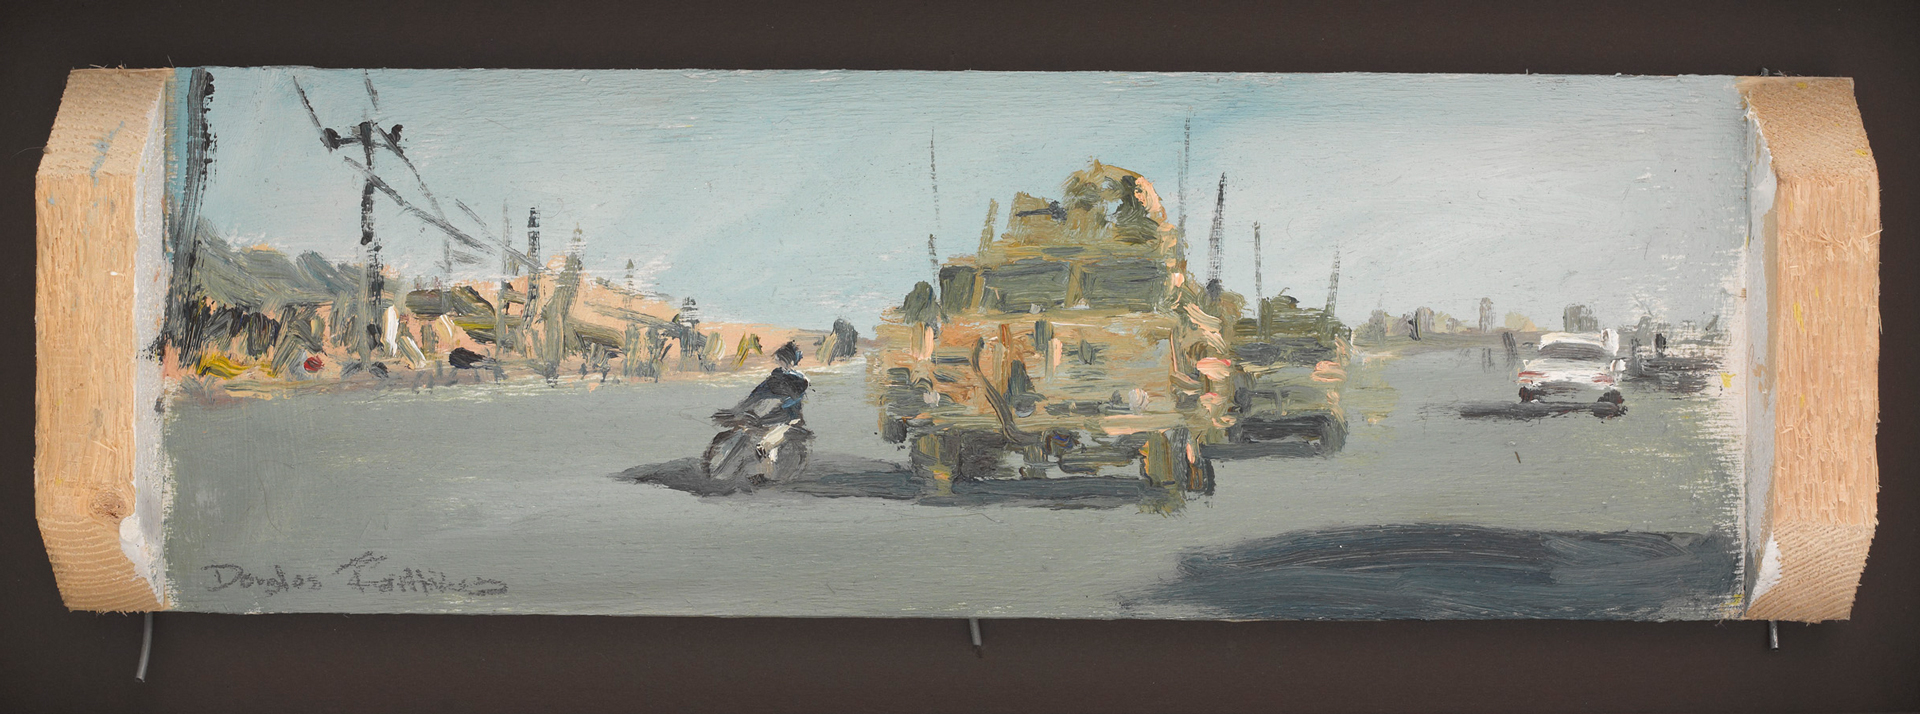 Kabul Street Scene, Afghanistan, by Sergeant Major Douglas Farthing MBE, 2012